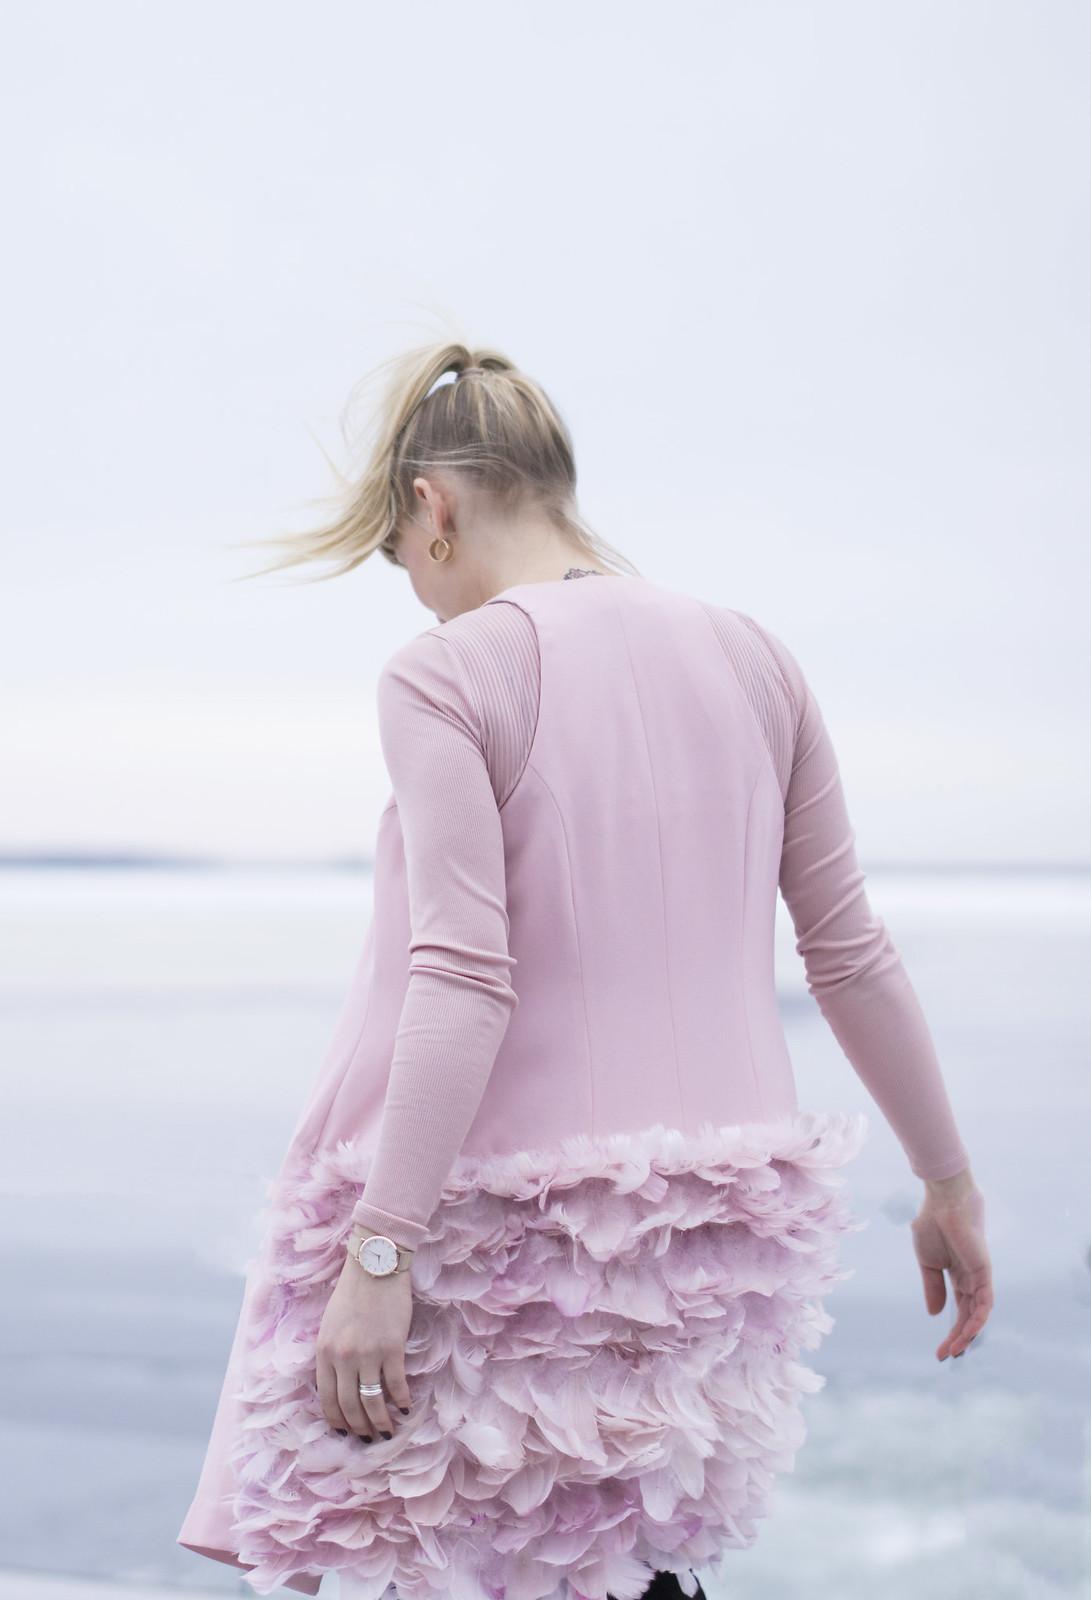 Anni Ruuth Sugar Helsinki